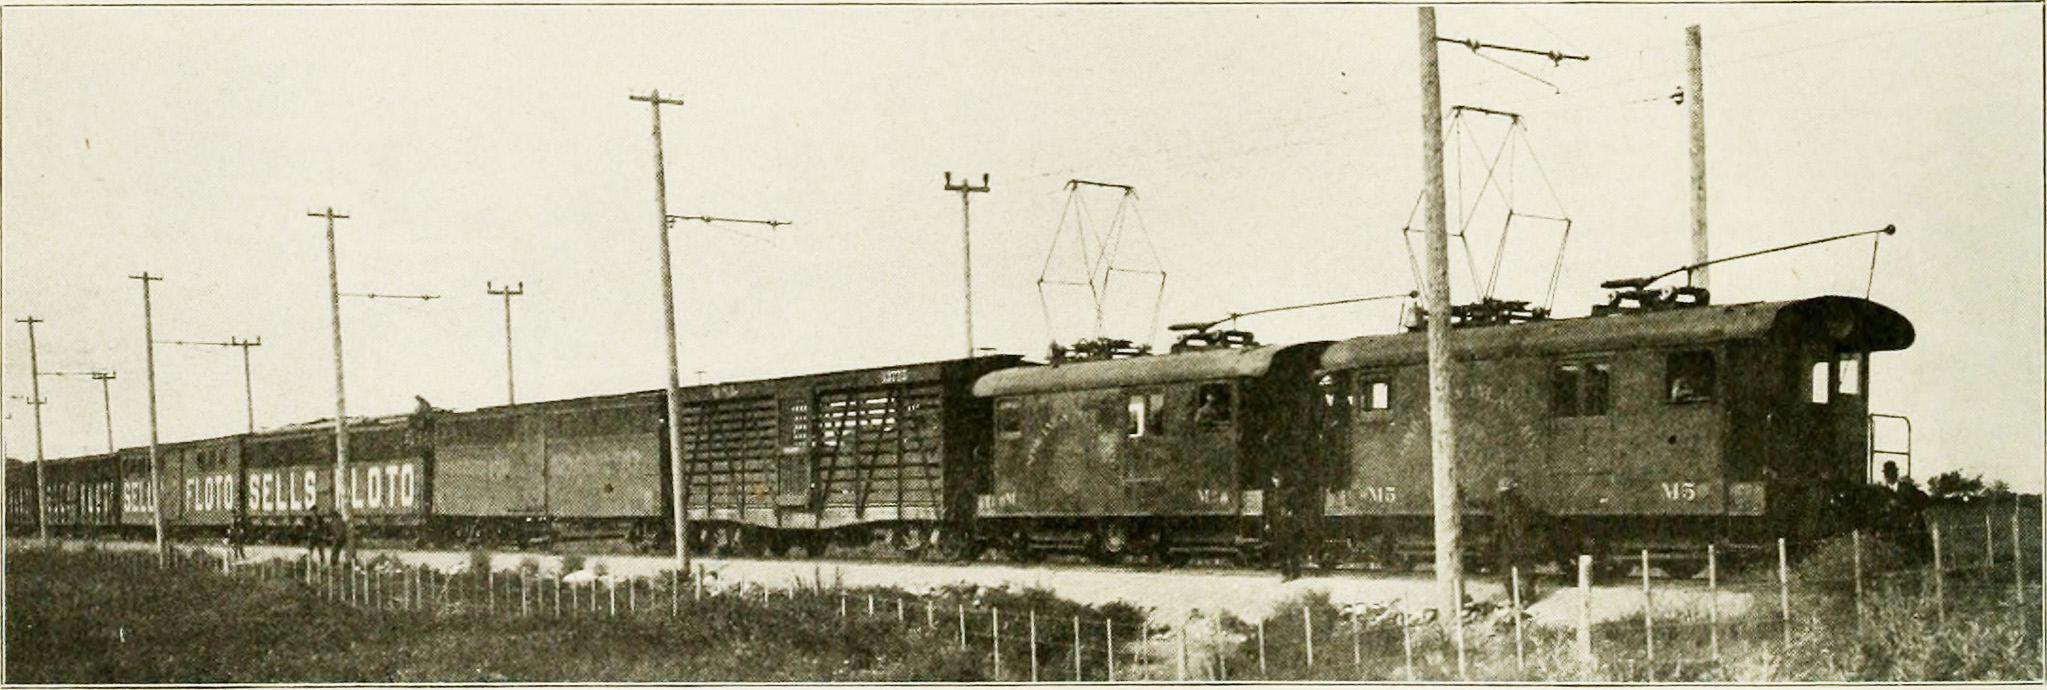 Electric-Circus-Train-USA